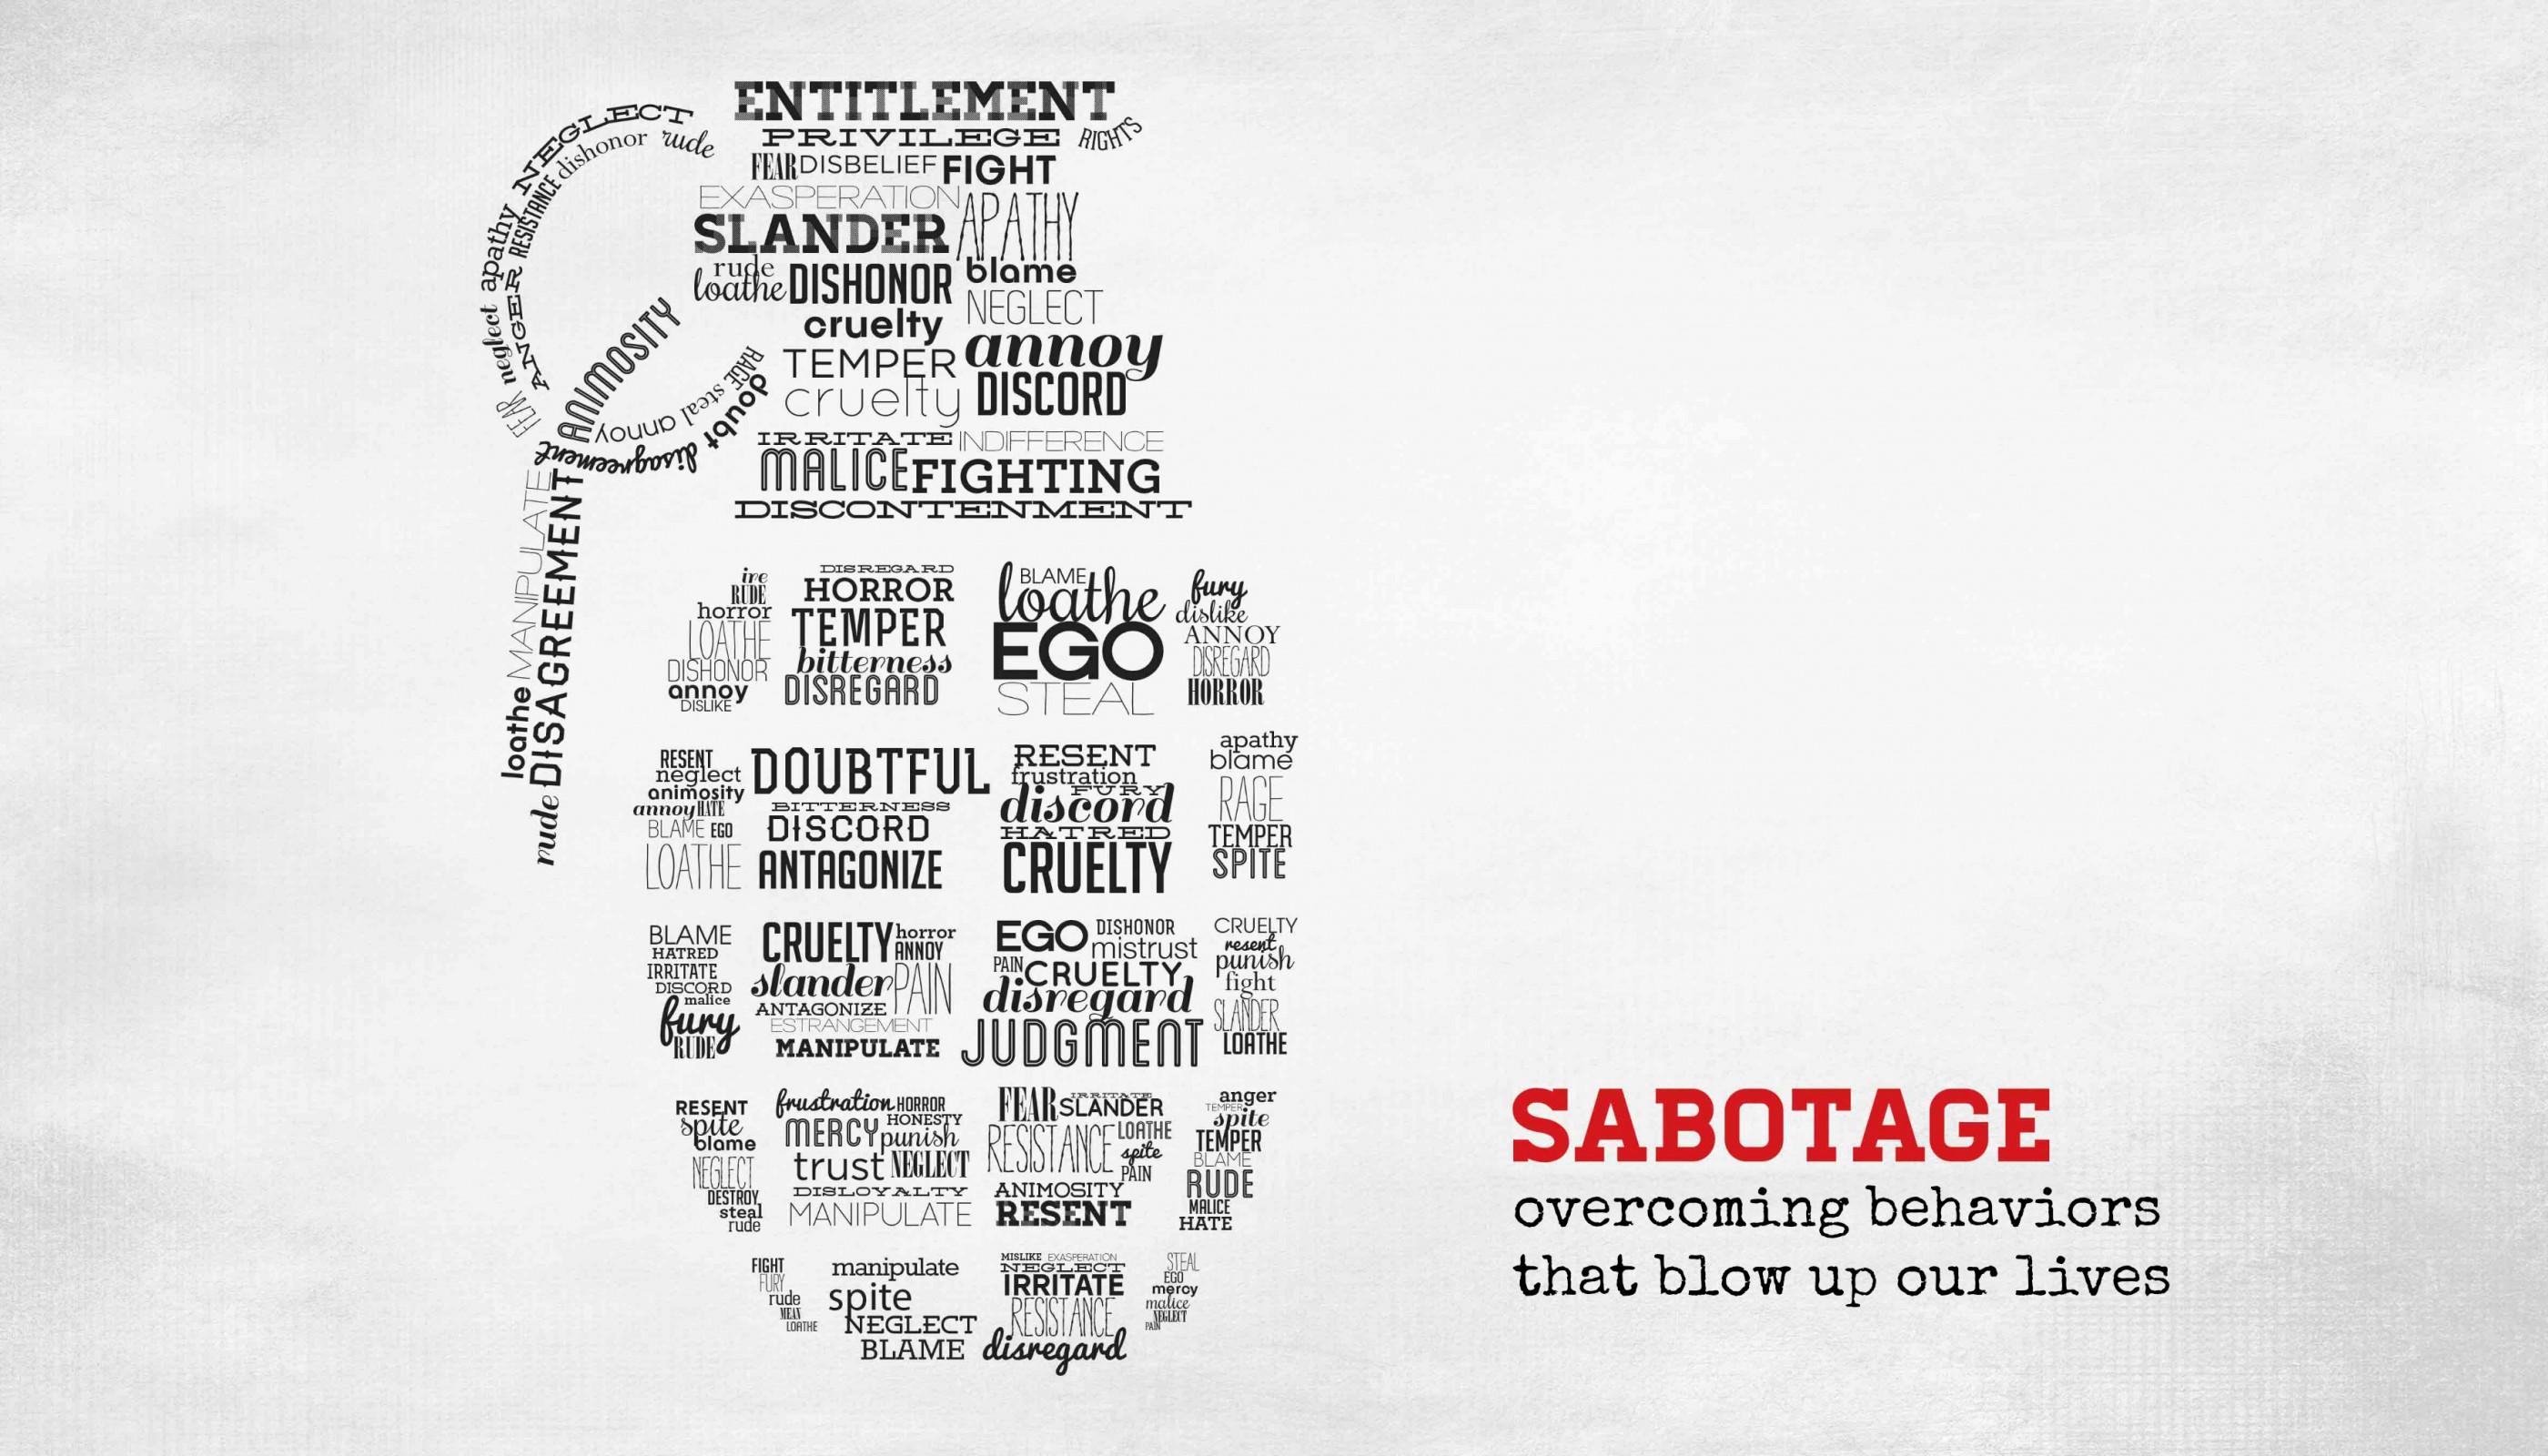 SabotageLg